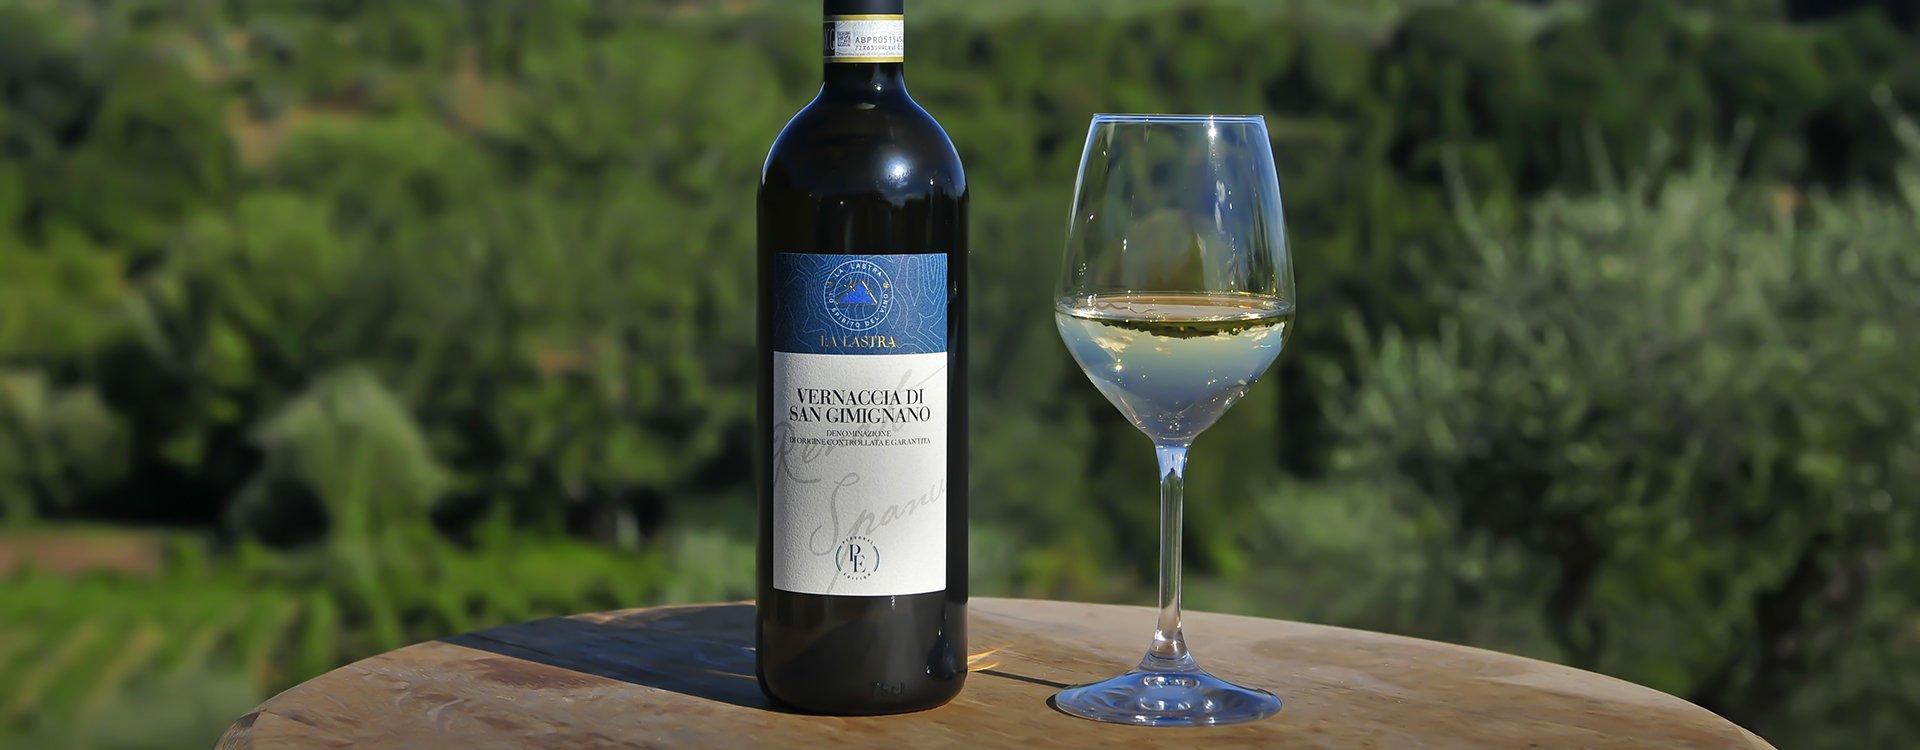 A Study on Aromagramme of Vernaccia di San Gimignano wine - La Lastra